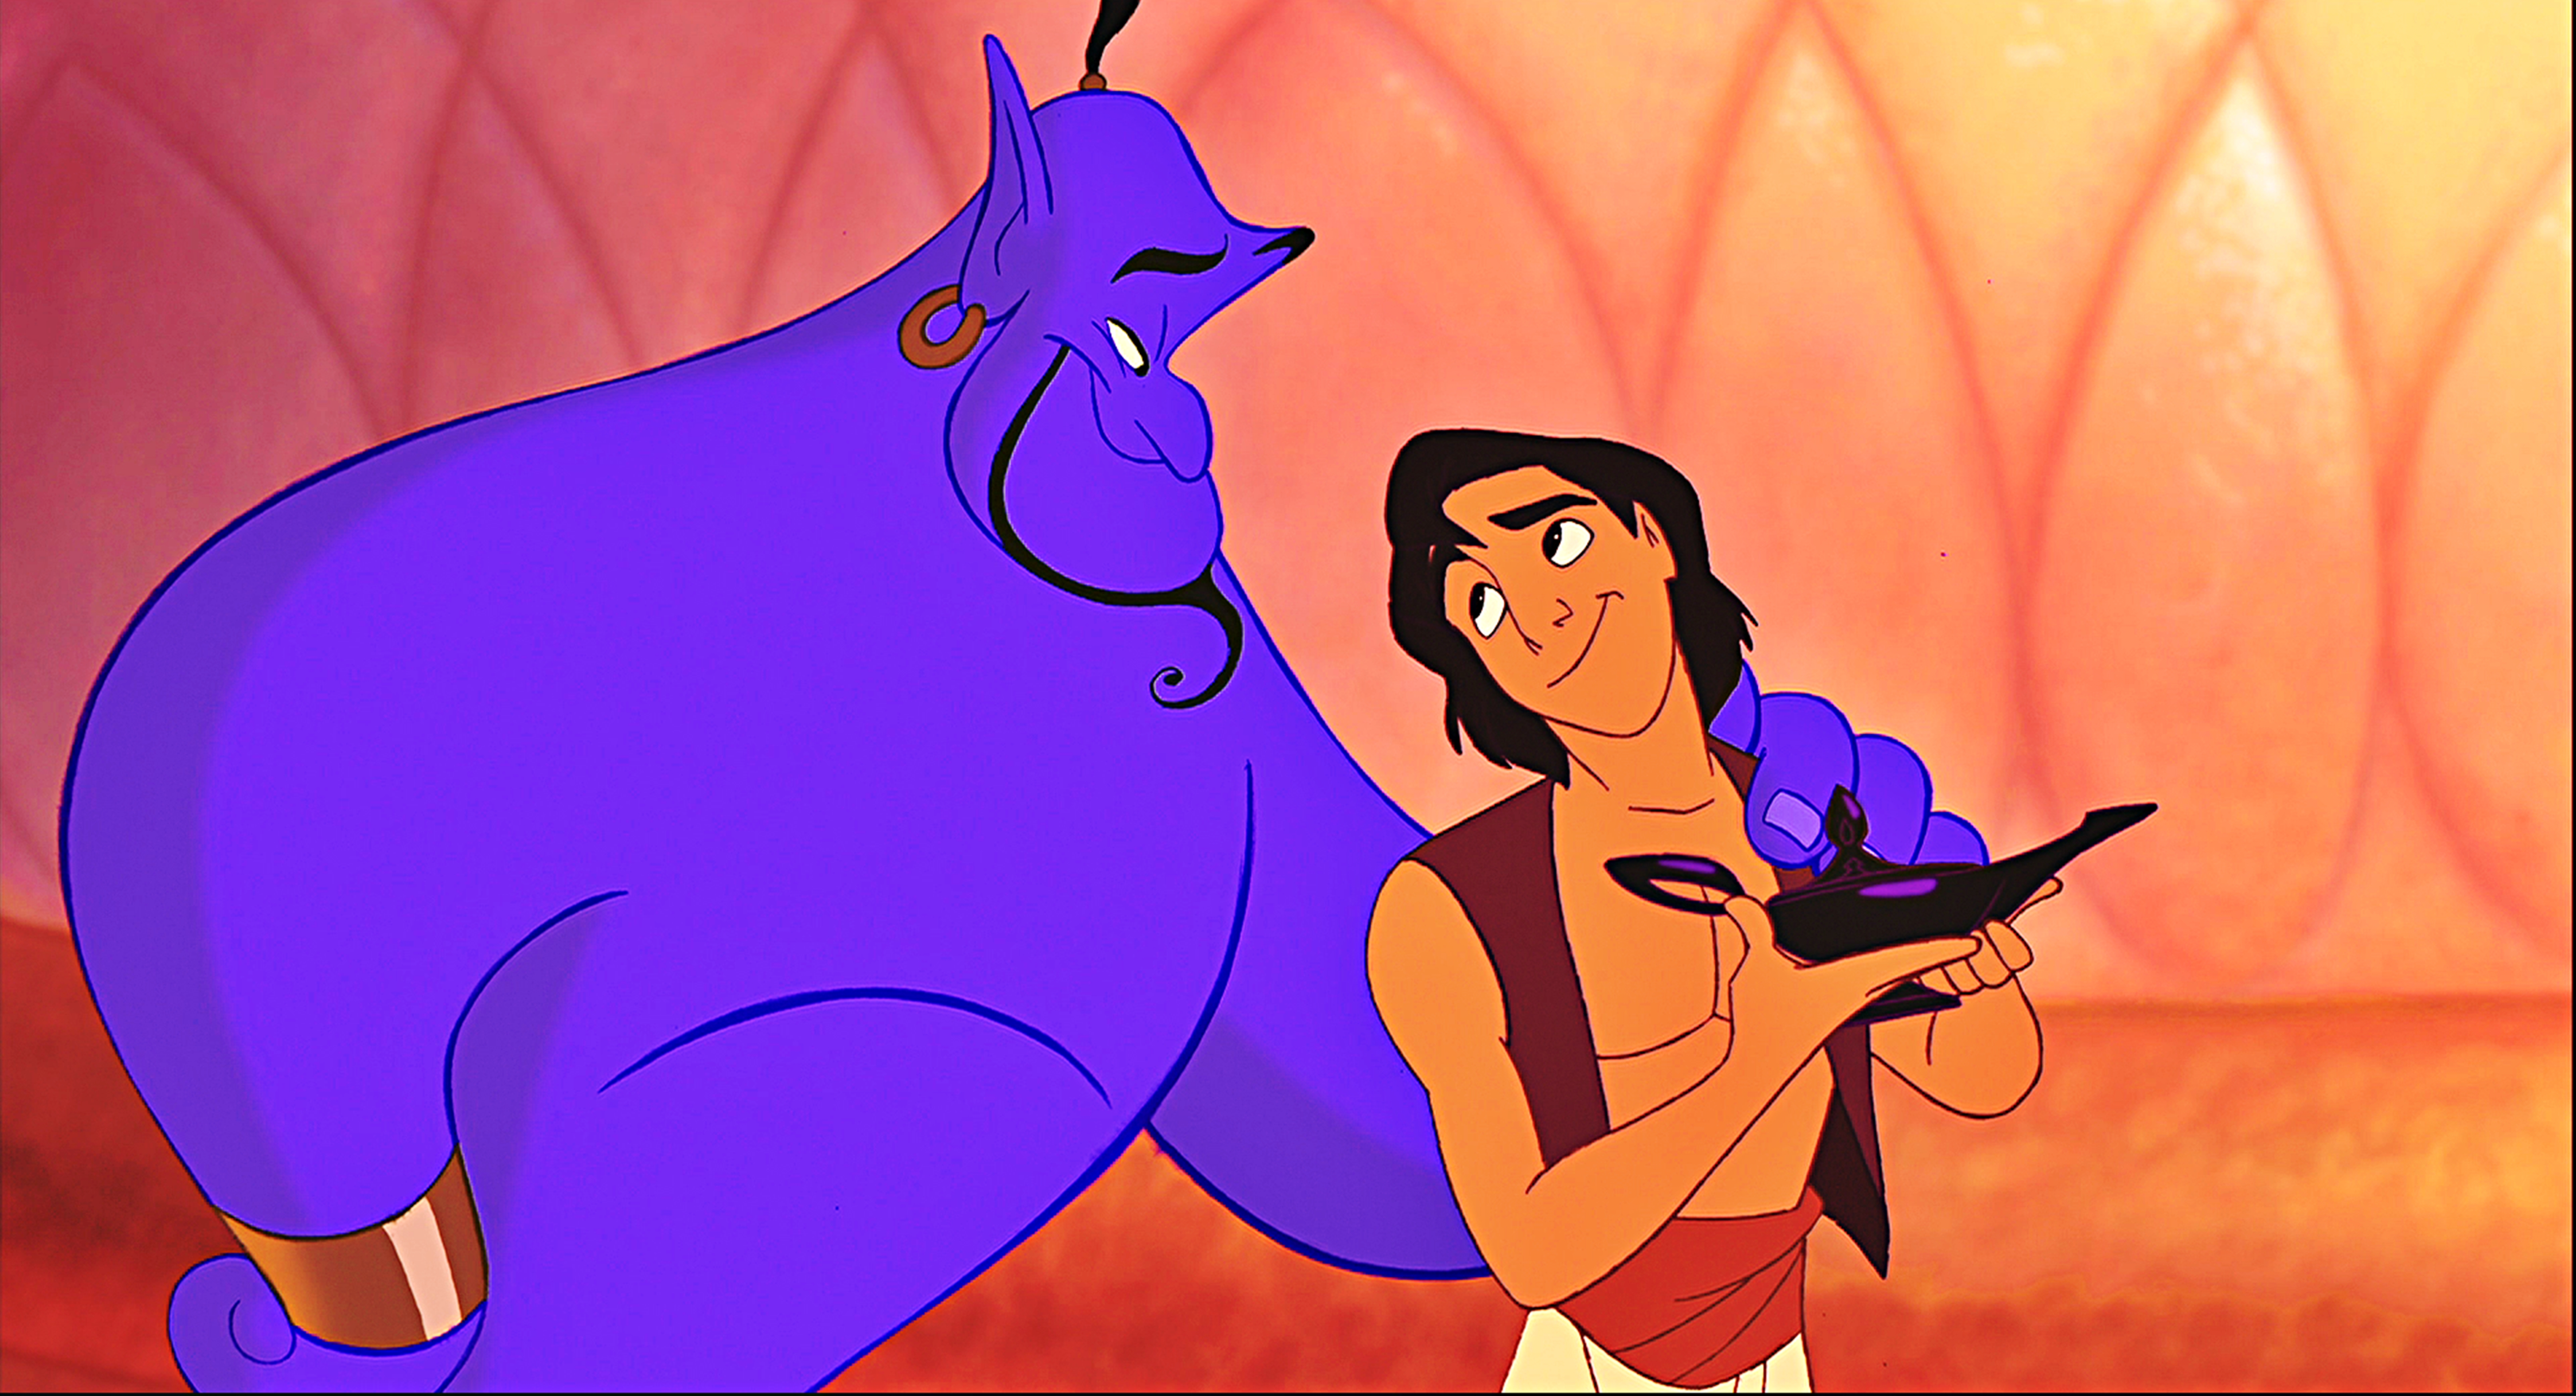 Robin Williams Genie Quote From Aladdins Final Scene Resonates Today VIDEO